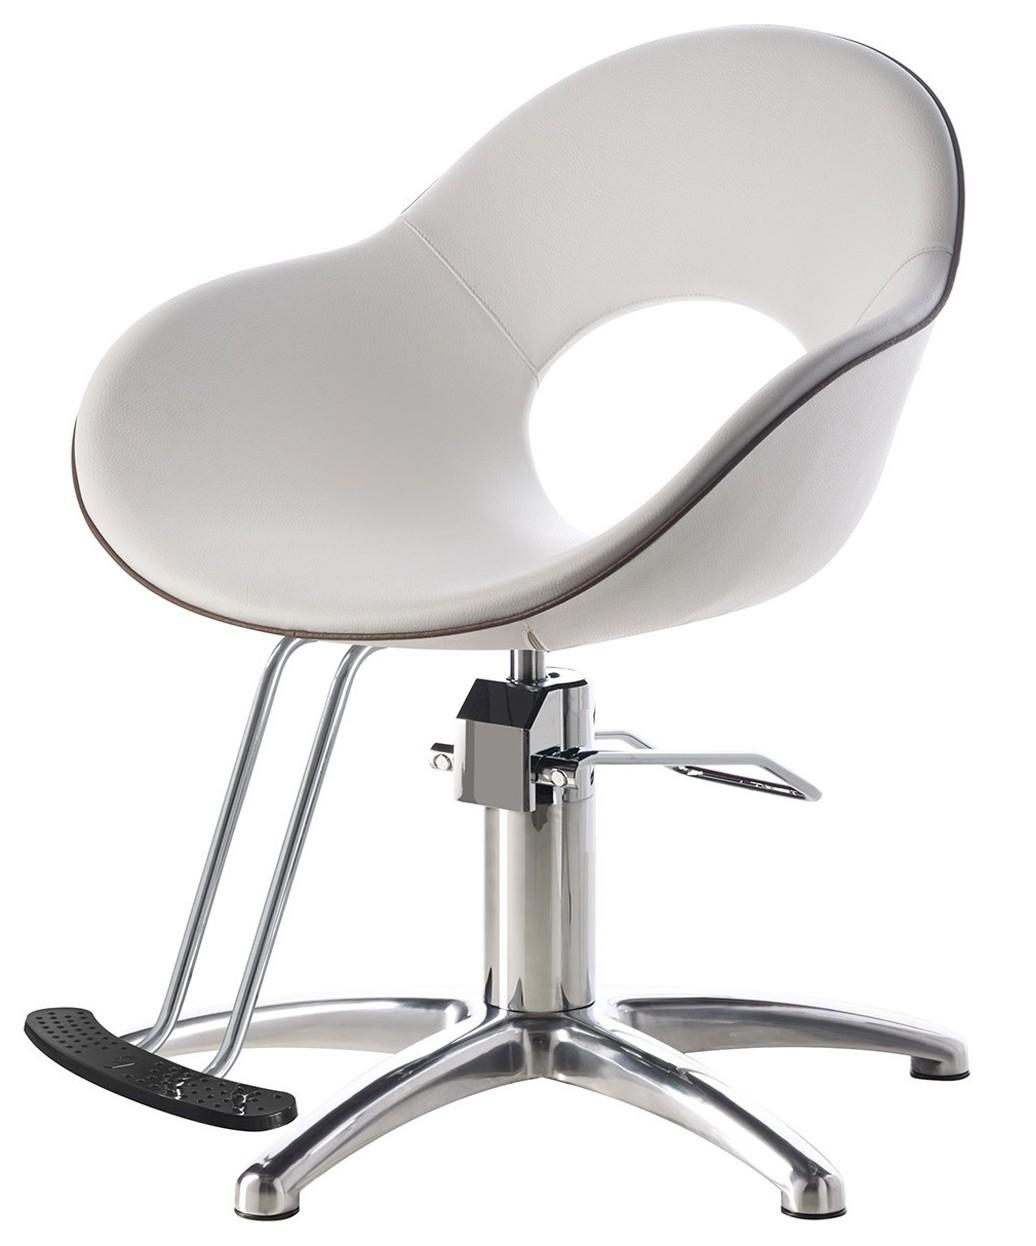 Luca Rossini Emilia Styling Chair